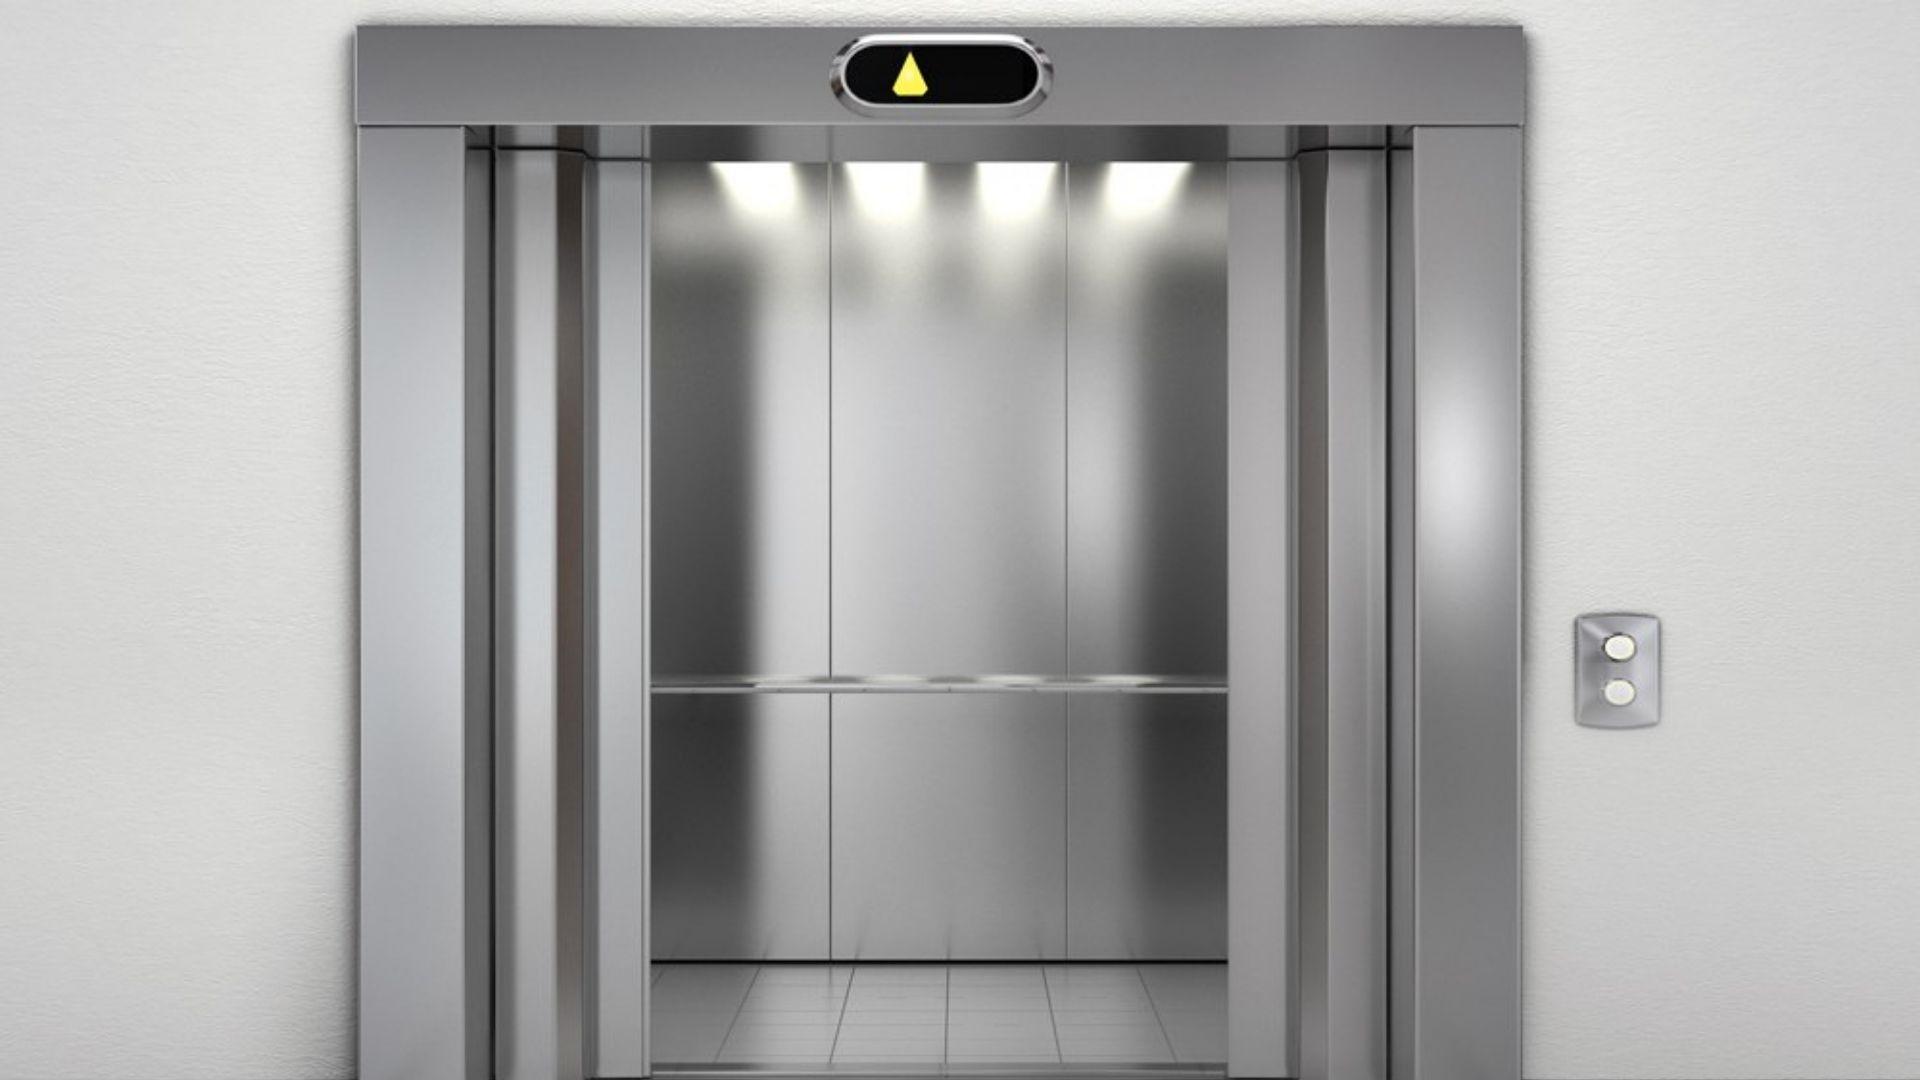 aluminium-composiet-lift-elevator-text